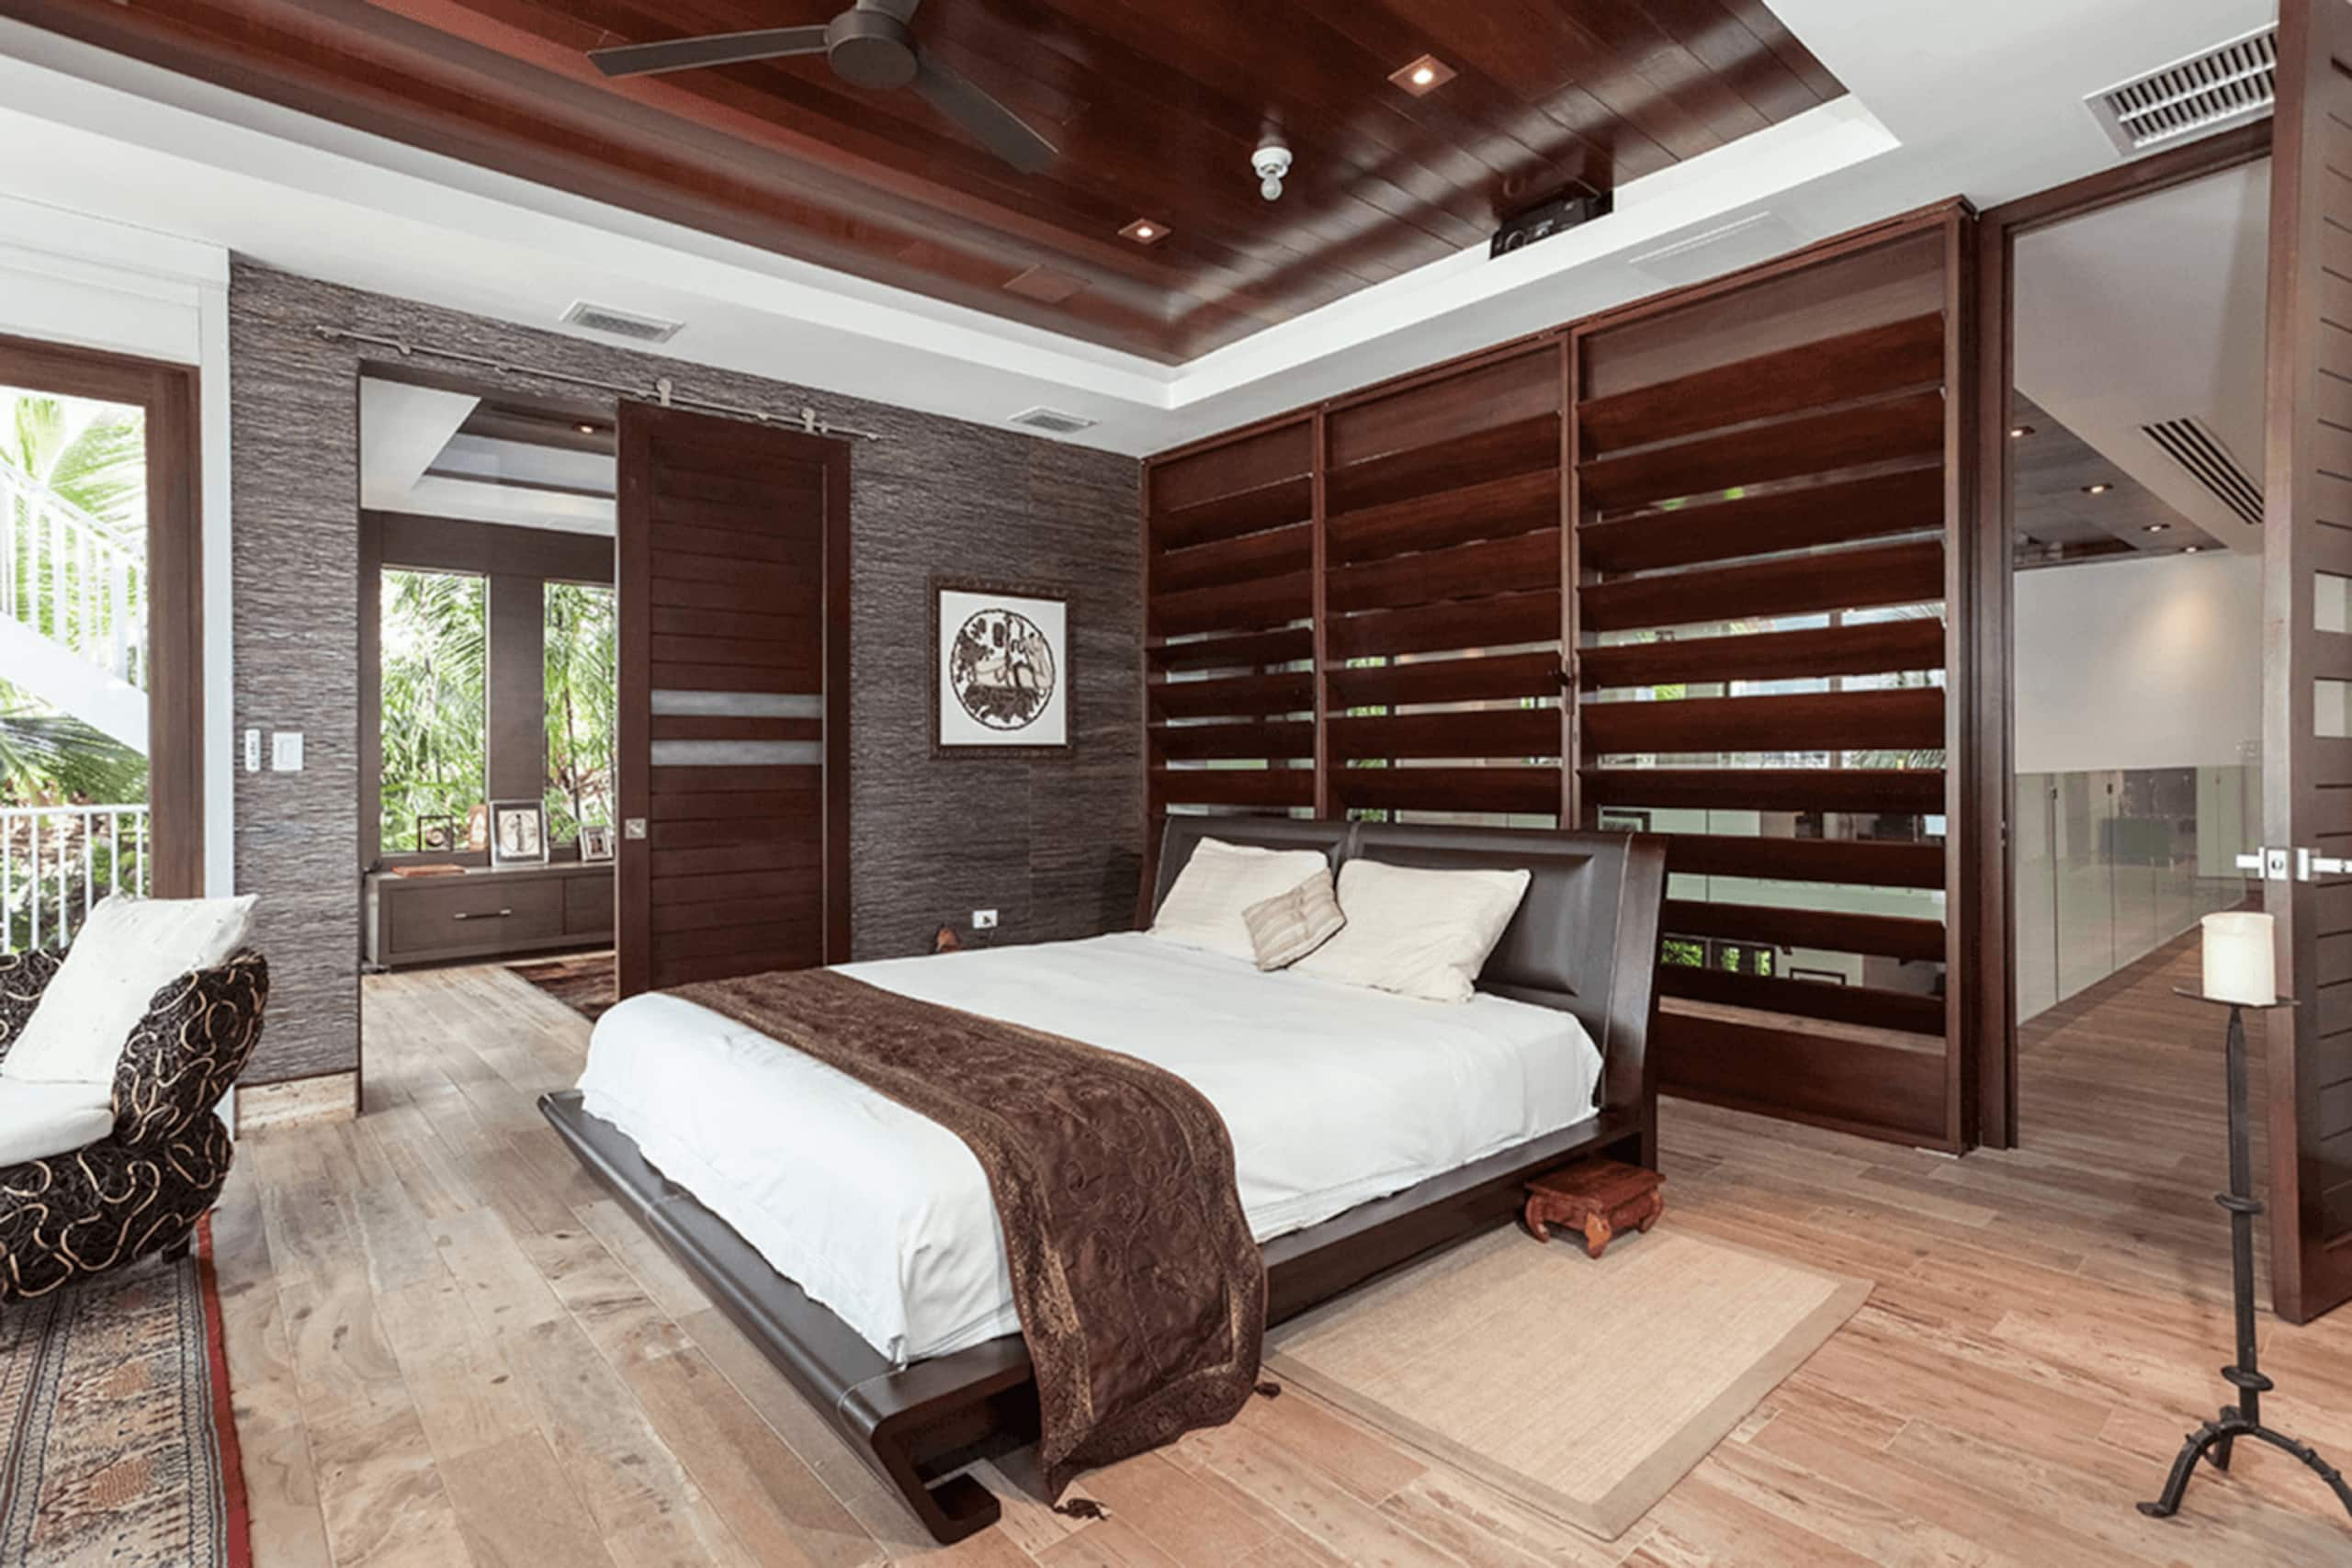 Apartment Villa Riza - Magnificent Balinese-style photo 20355444